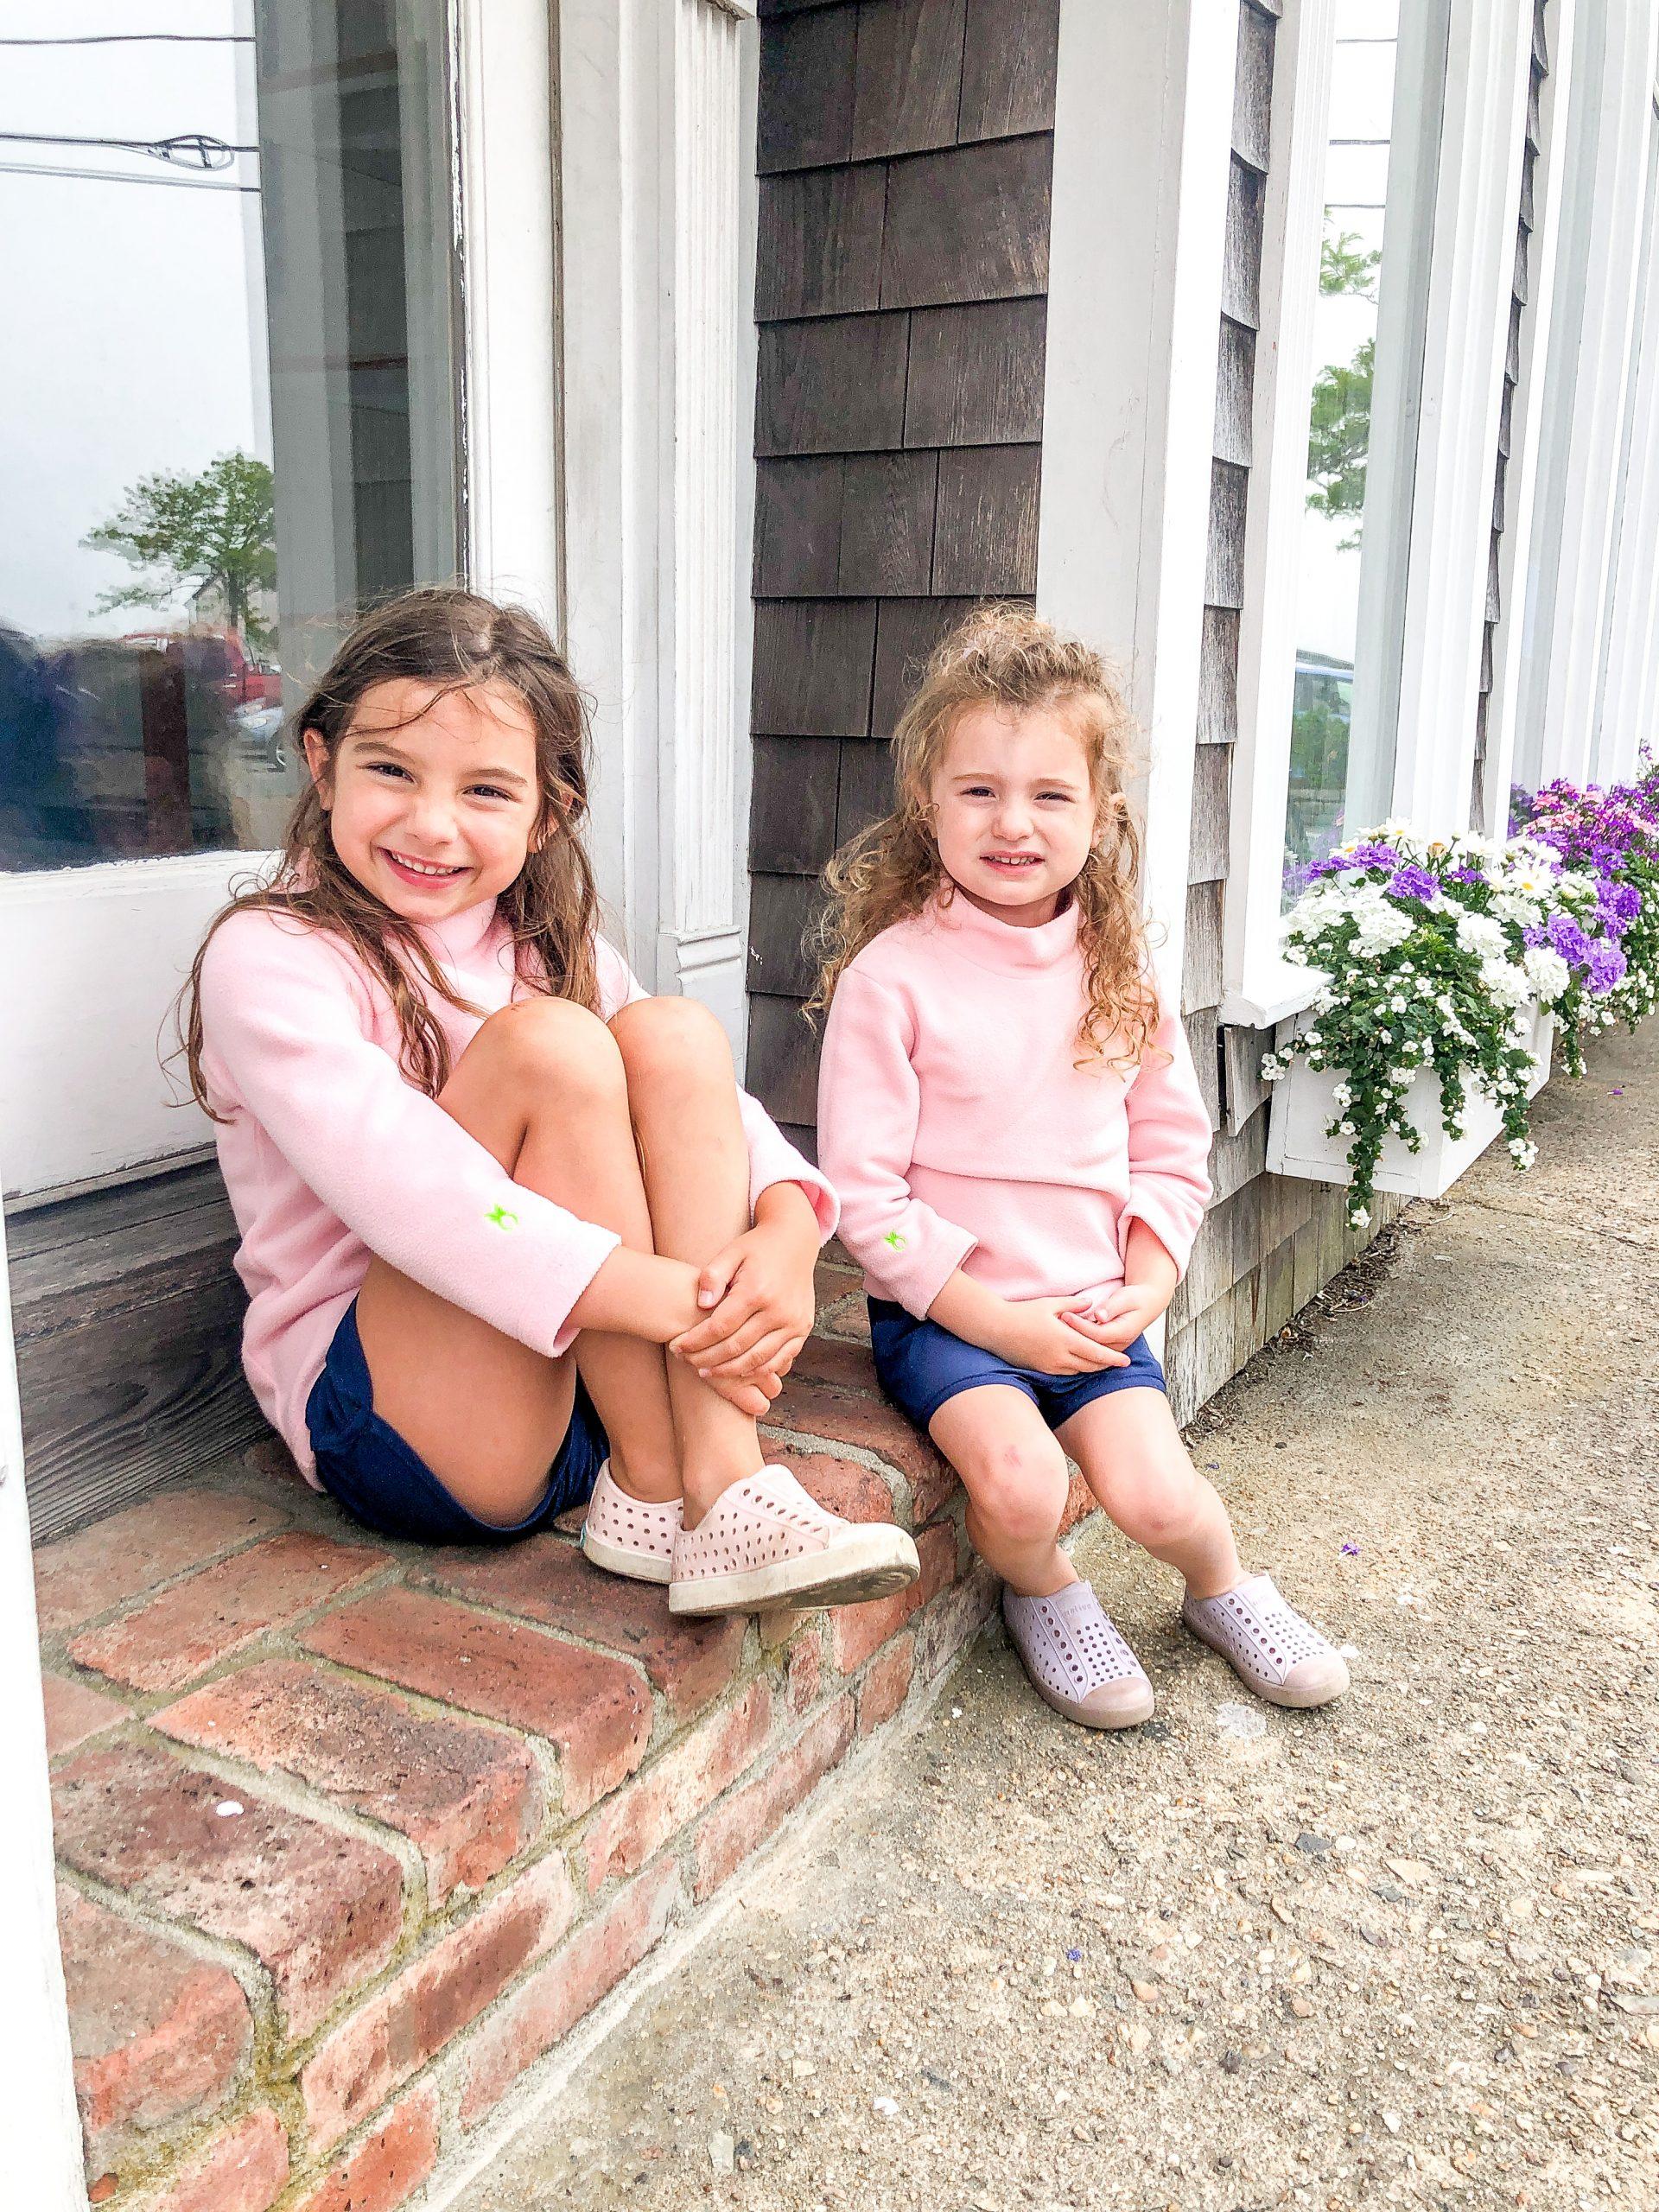 little girls sitting on stoop outside shops in Edgartown wearing Dudley Stephens